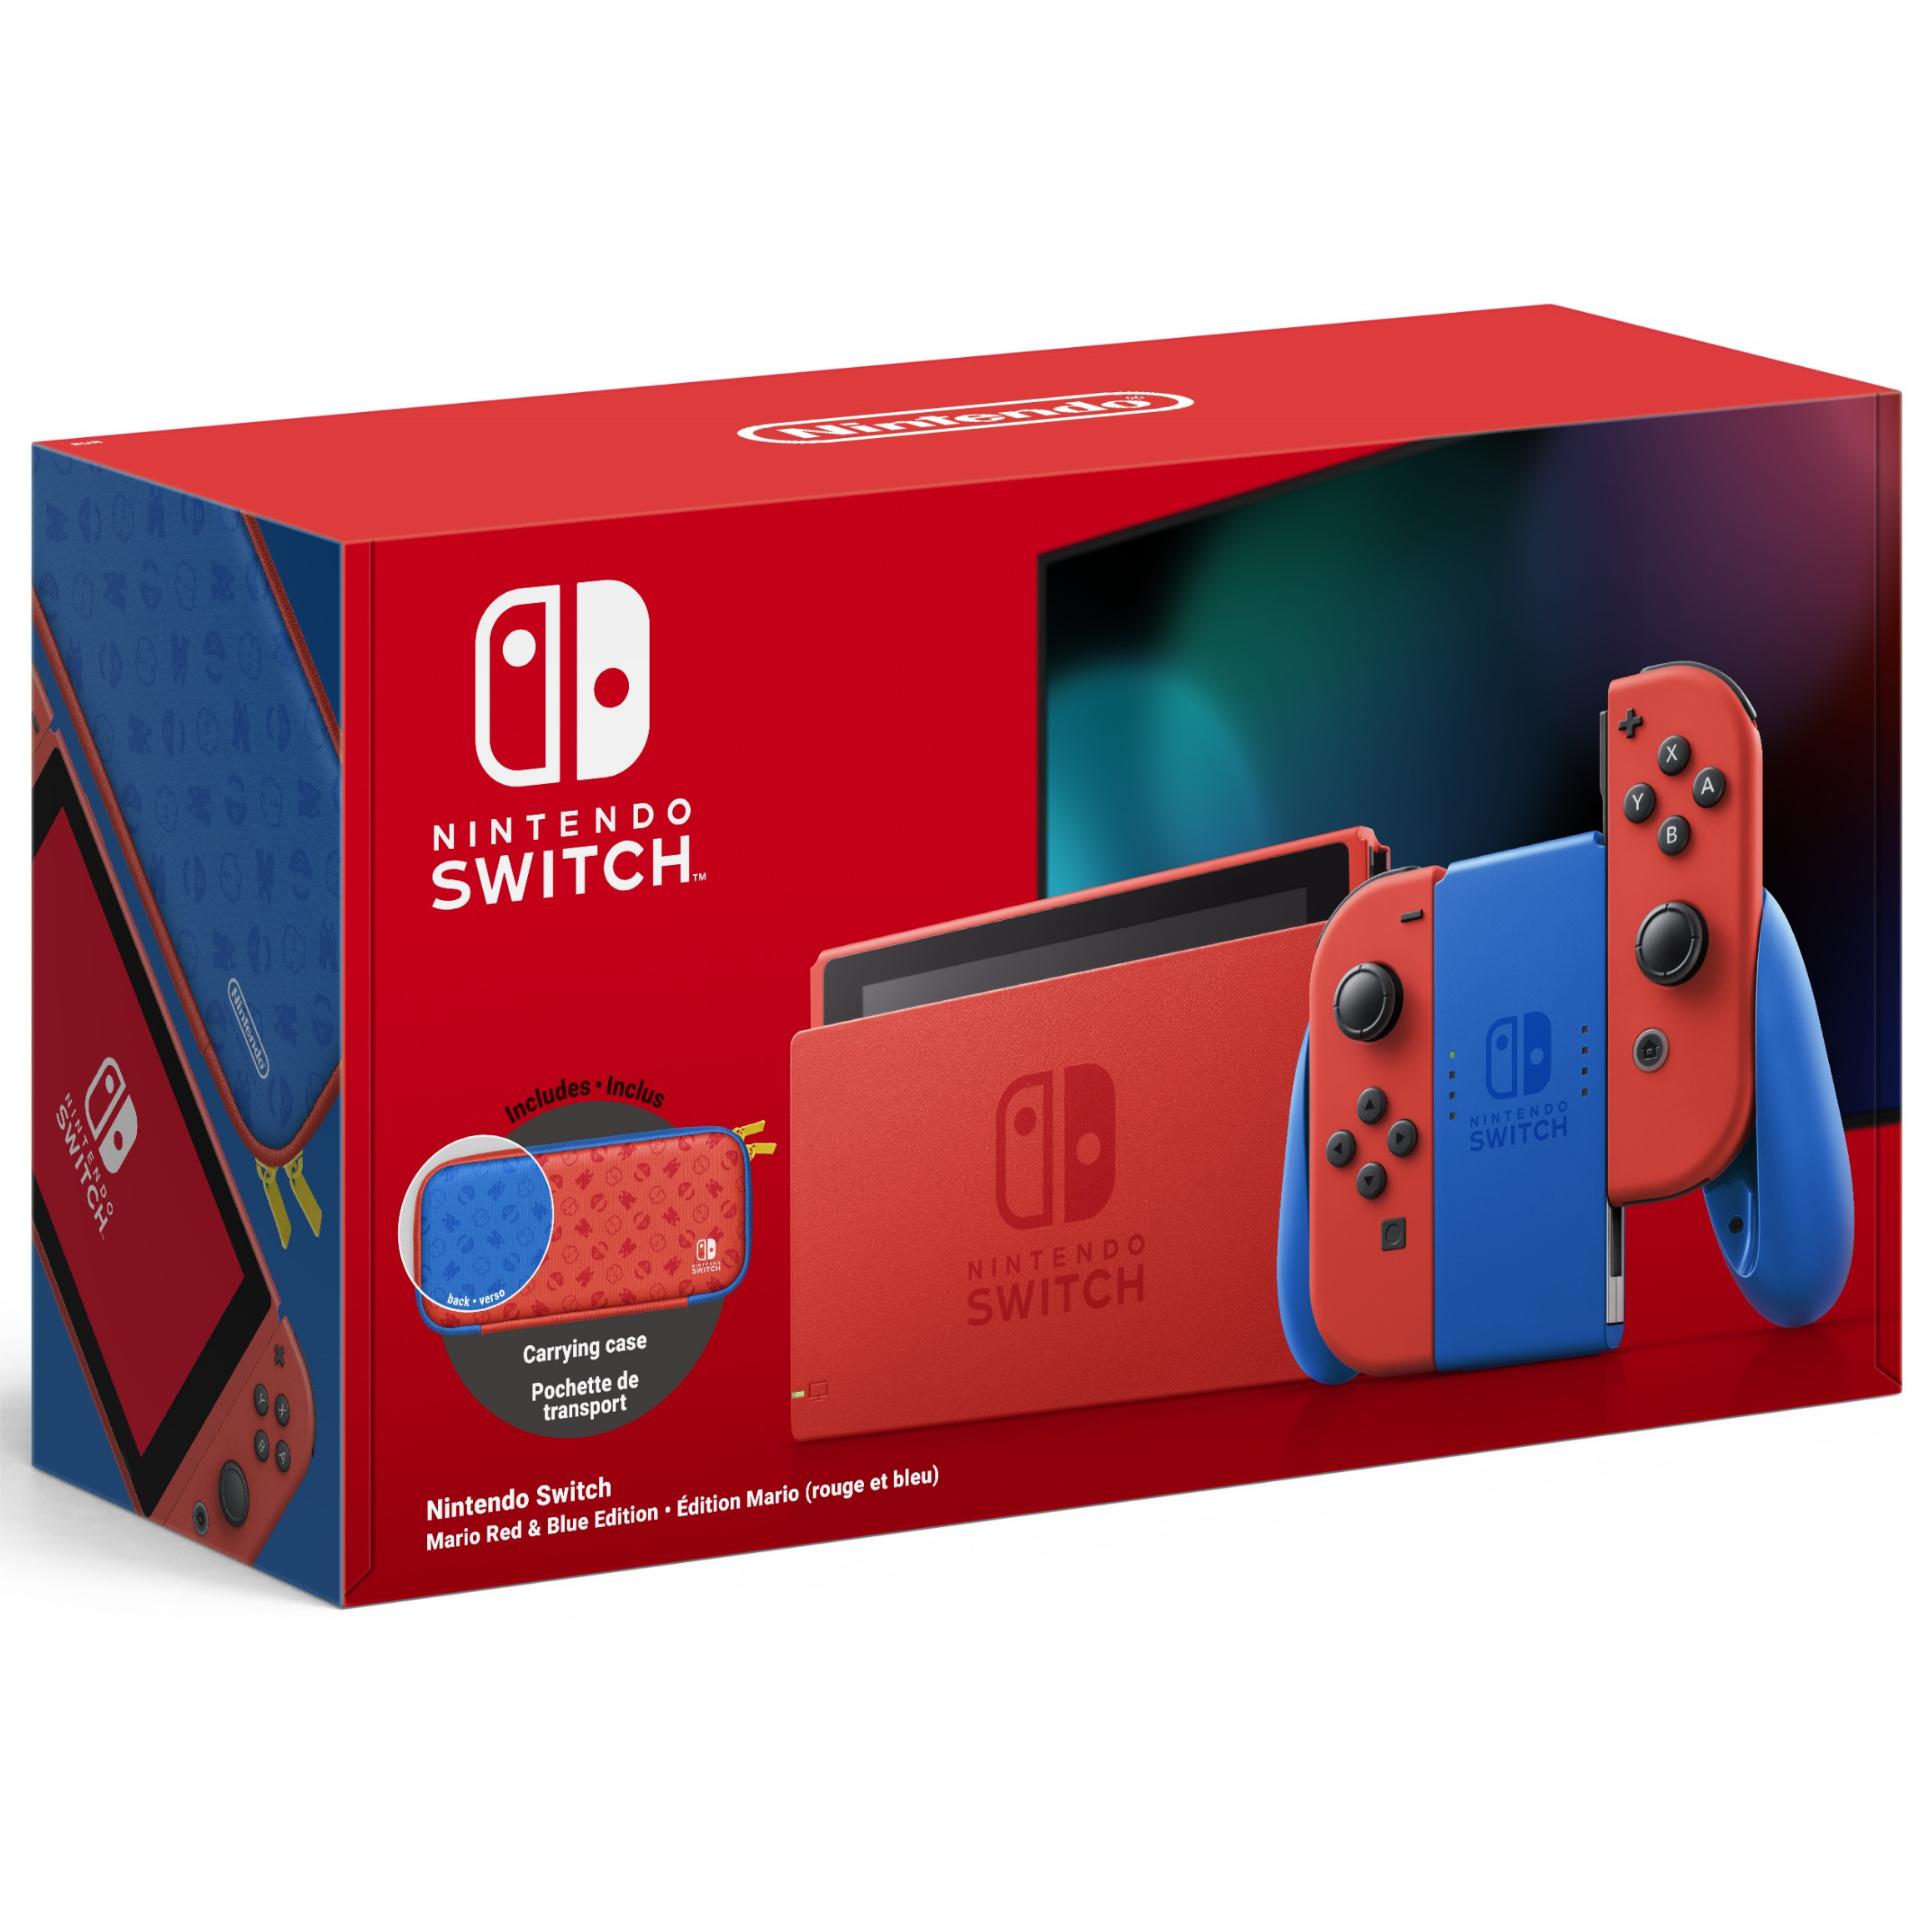 Nintendo Switch: Mario Red & Blue Edition (inkl. Tragetasche, 32GB Speicher, HD Display, Nvidia Tegra X1, 4310mAh Akku, 398 Gramm)